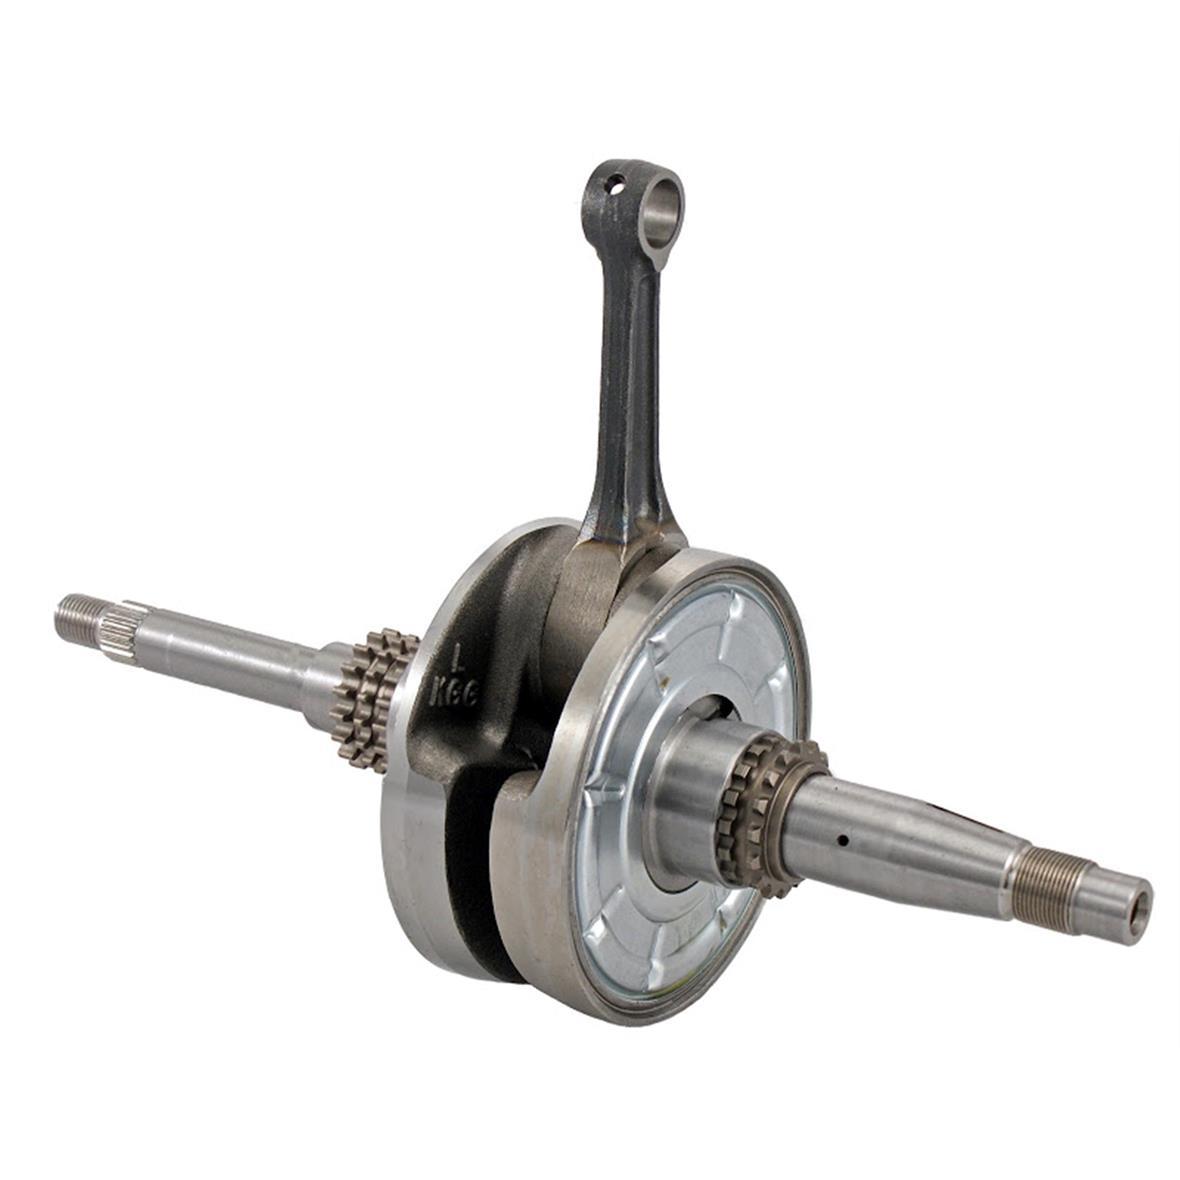 Product Image for 'Crankshaft RMSTitle'